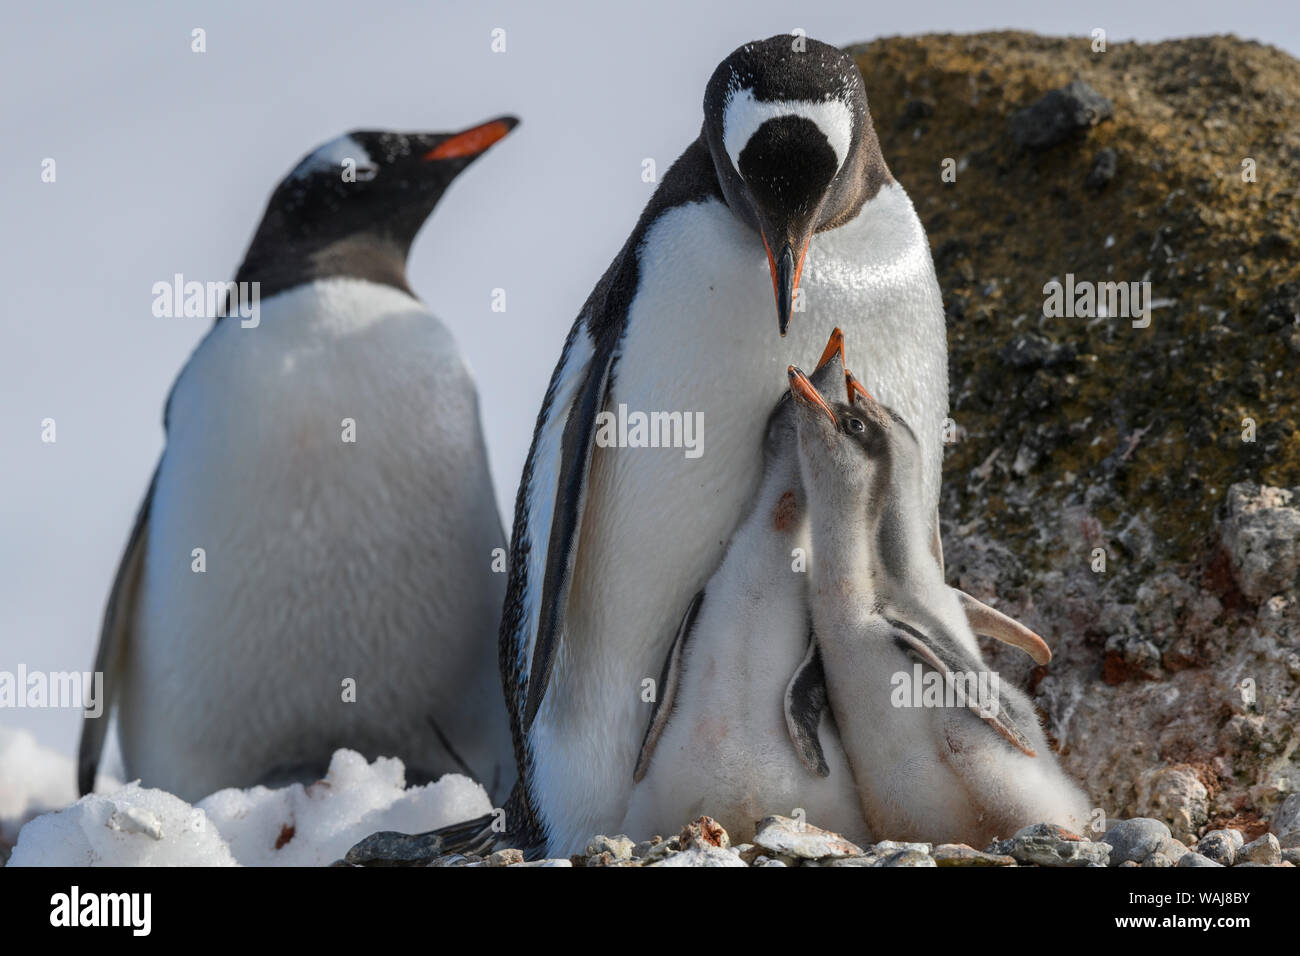 Antarctica, Antarctic Peninsula, Brown Bluff. Gentoo penguin feeding three chicks. Stock Photo